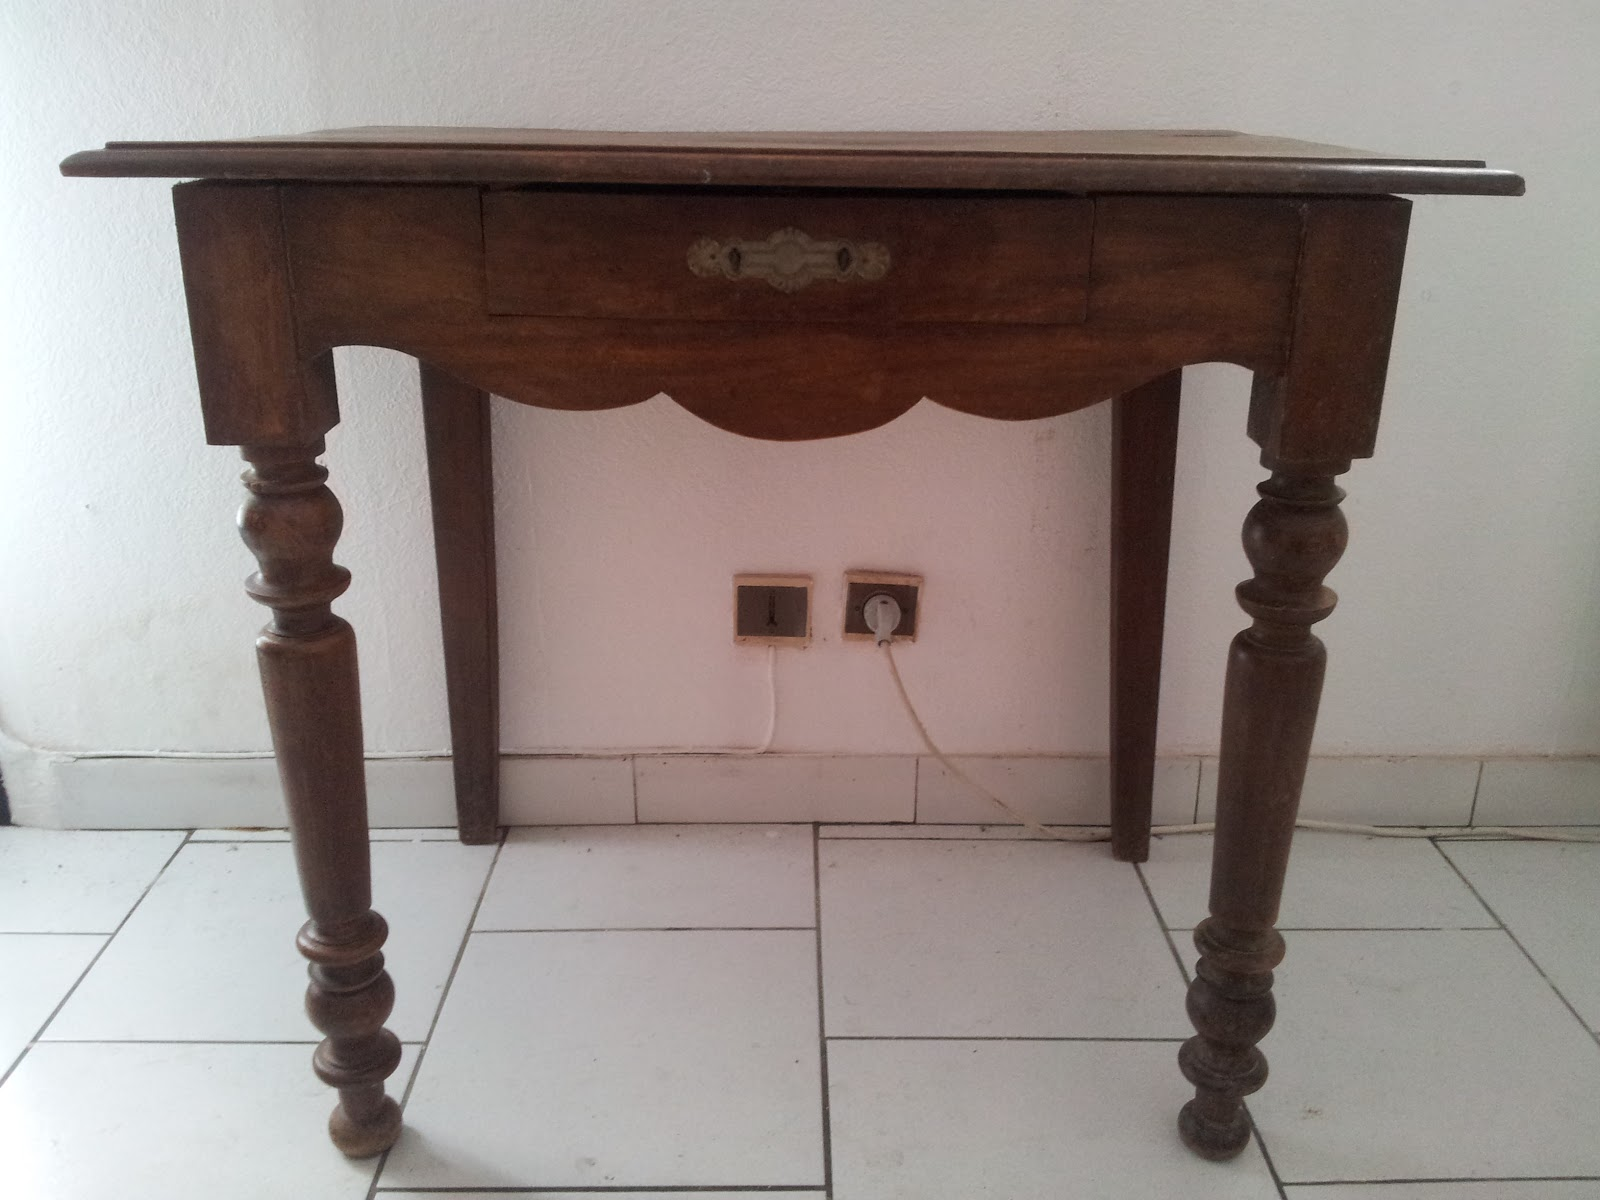 troc and broc petit bureau ou table. Black Bedroom Furniture Sets. Home Design Ideas